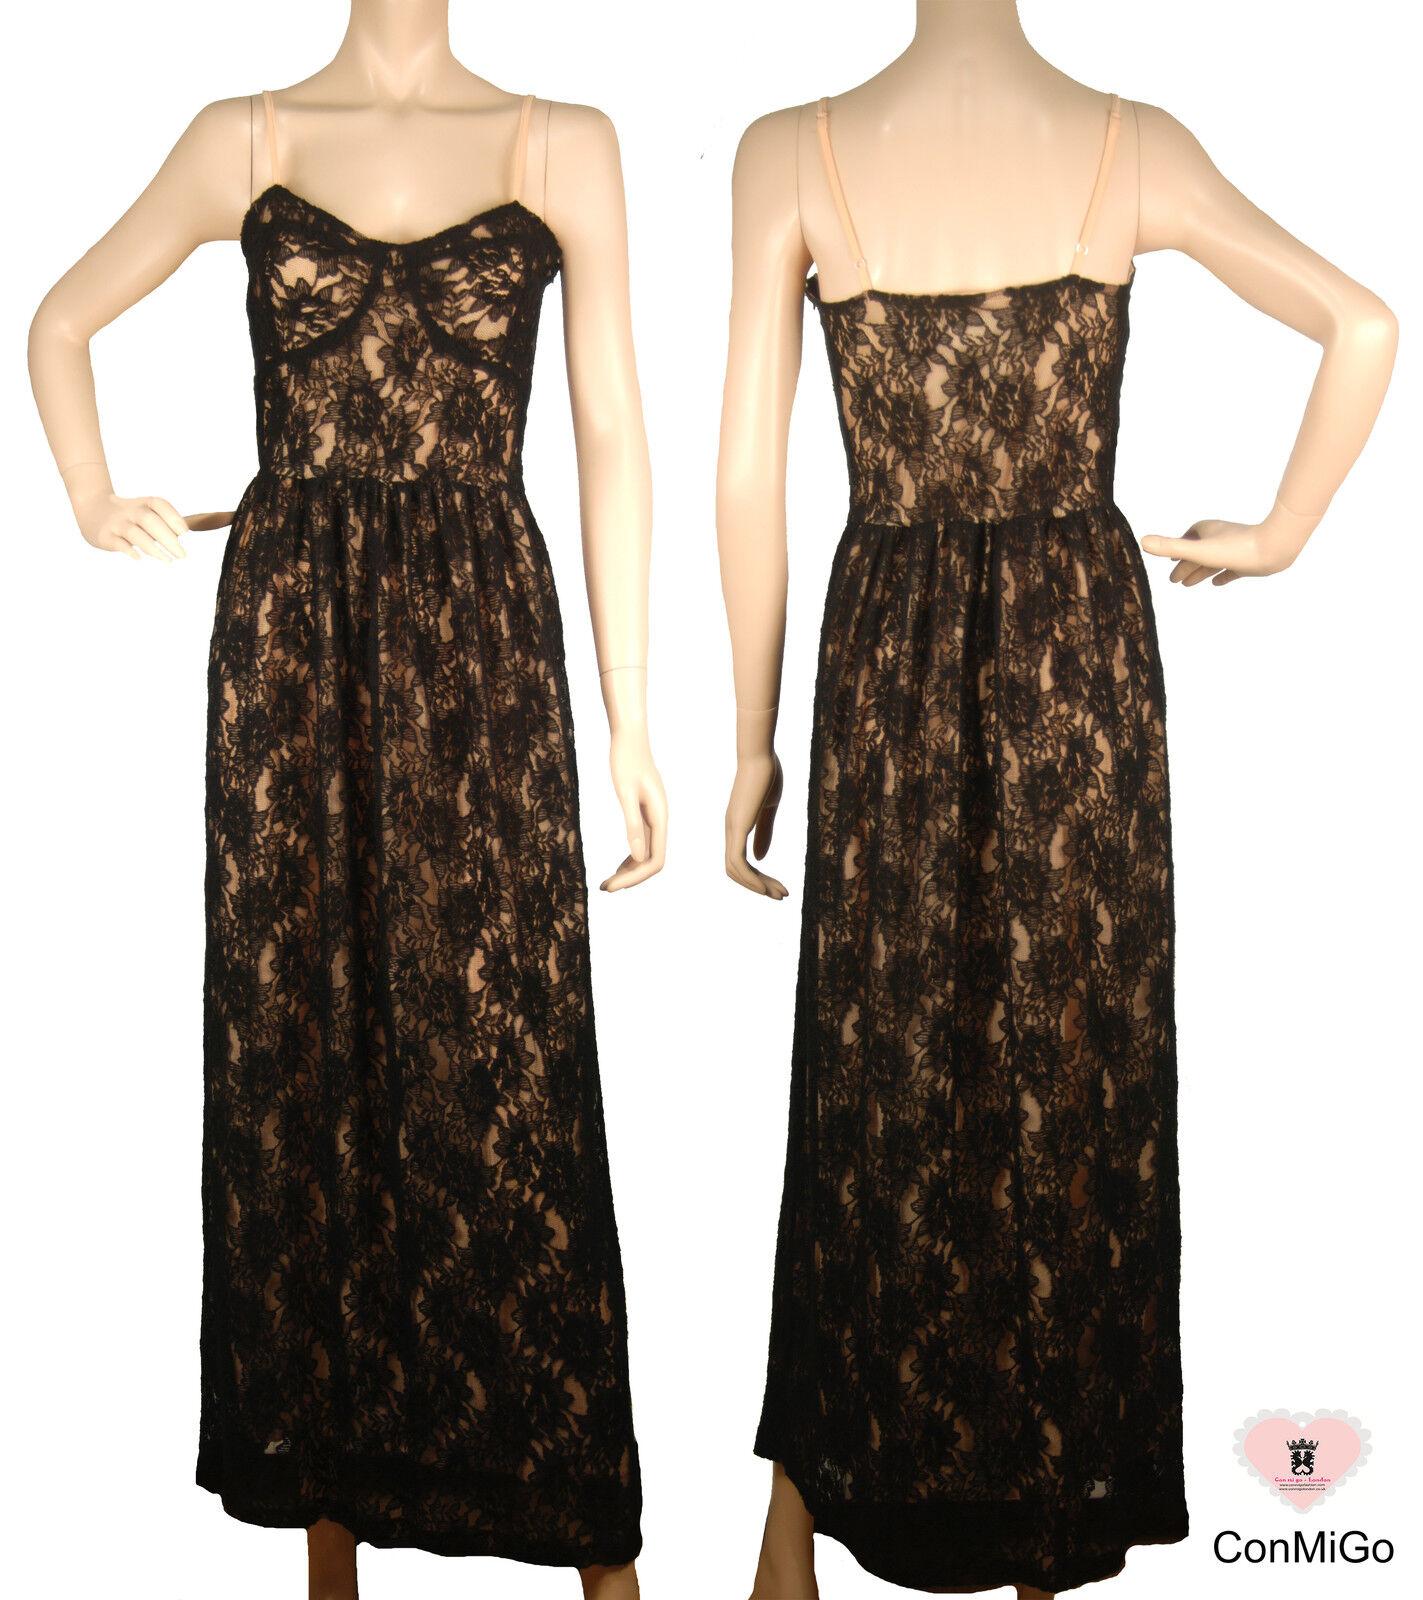 Wedding Party Dress - ConMiGo Striped Lace Maxi Dress - Blak - S M Size